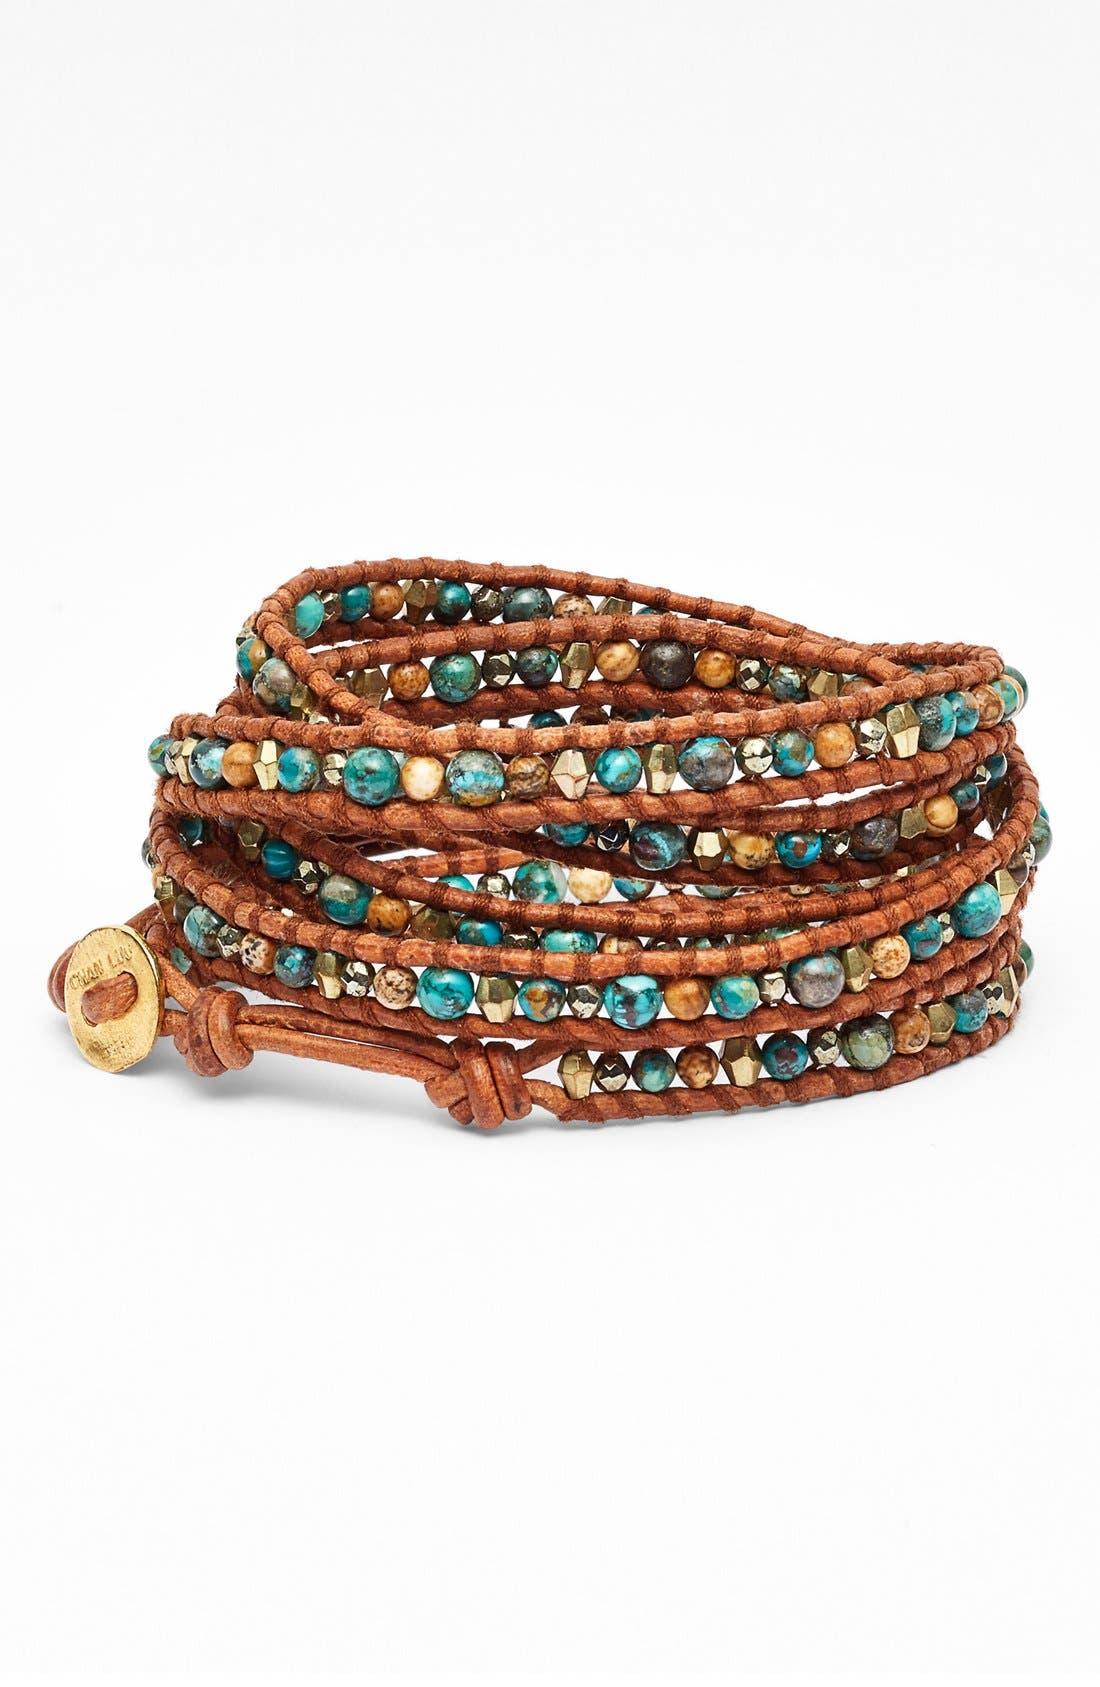 Alternate Image 1 Selected - Chan Luu Beaded Leather Wrap Bracelet